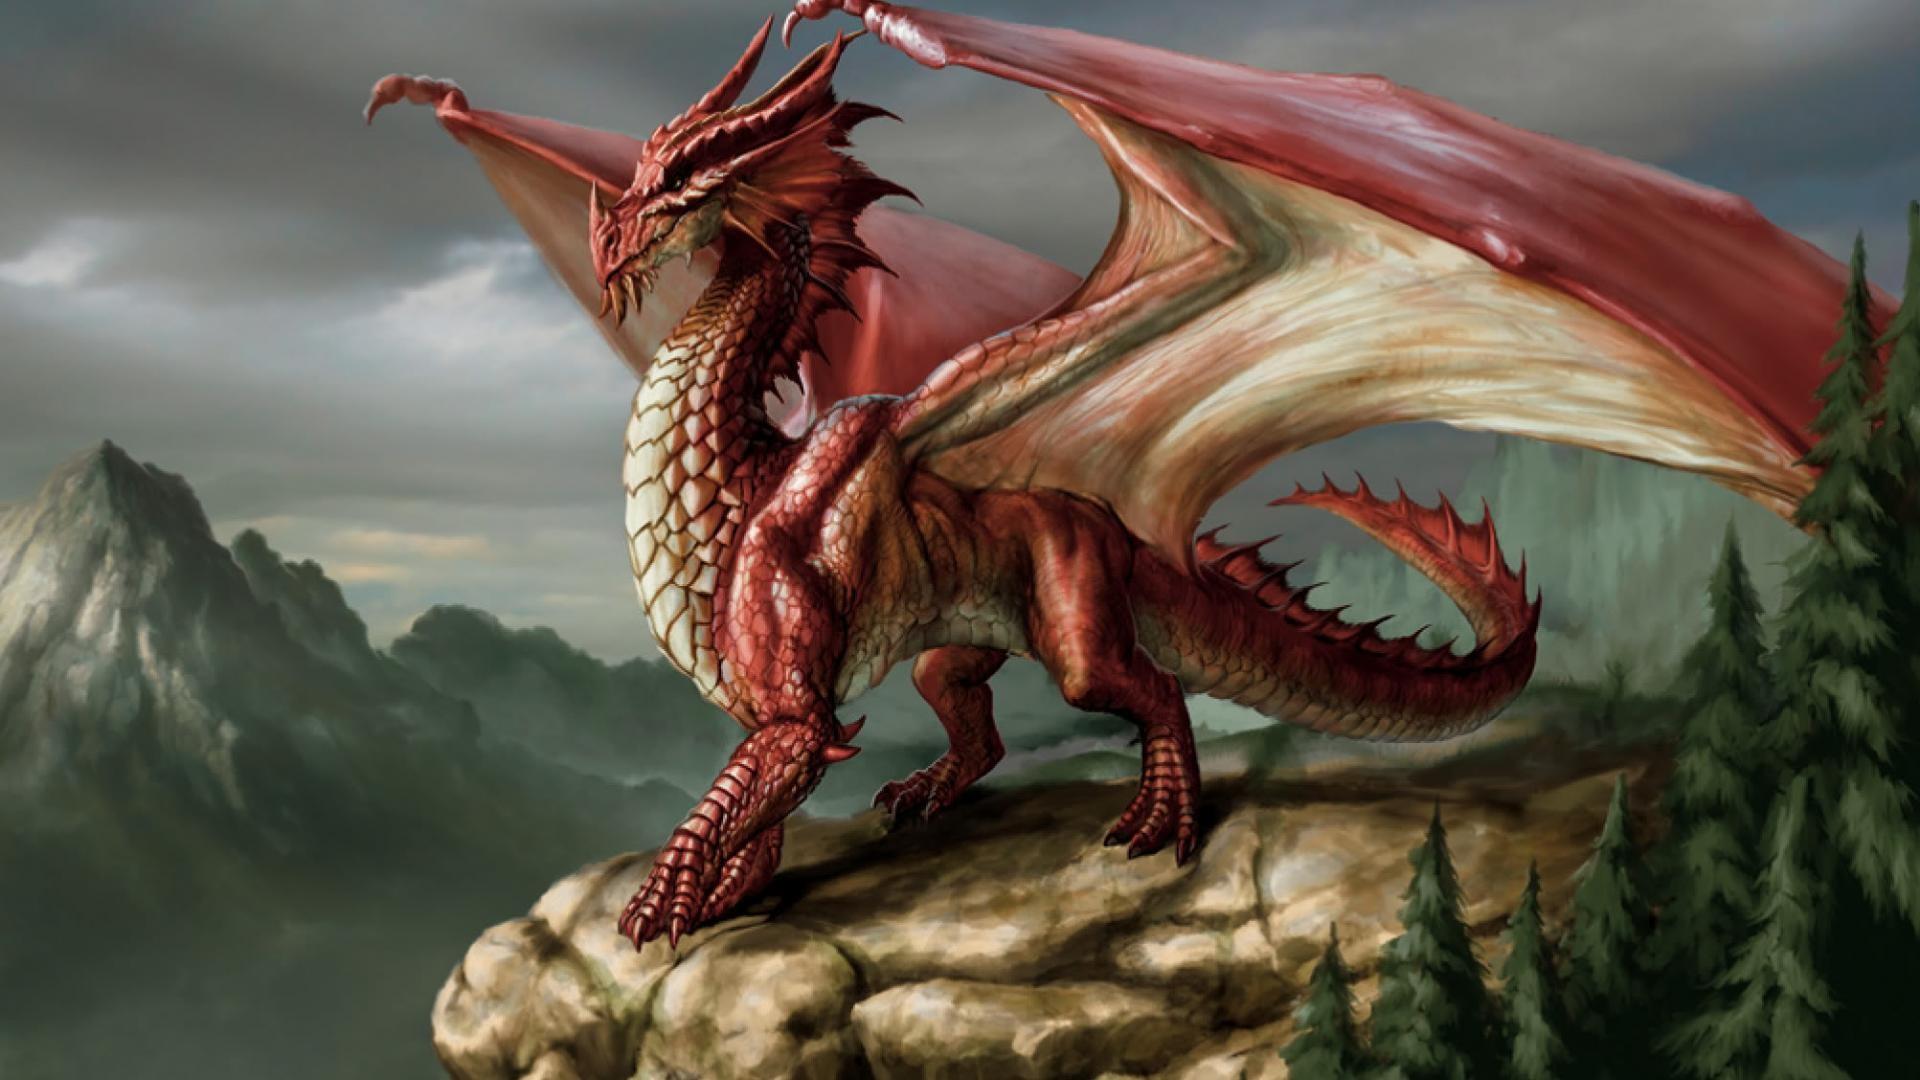 Majestic Red Dragon Wallpaper